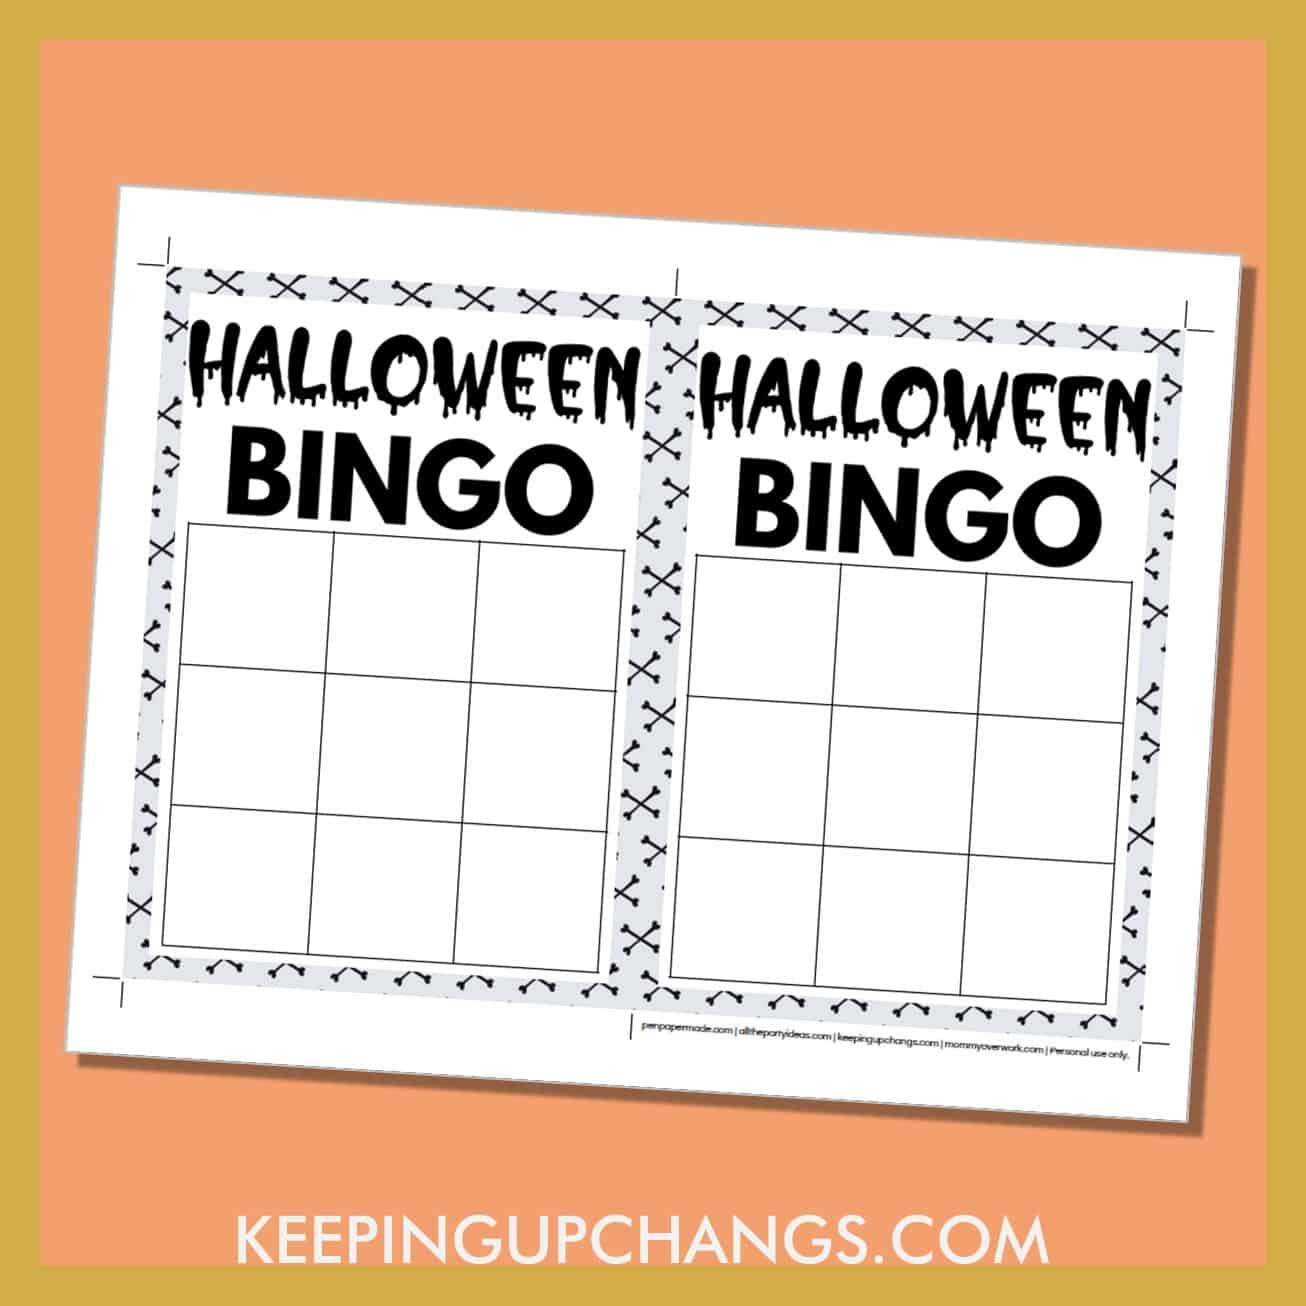 free halloween bingo 3x3 grid black white game board blank template.